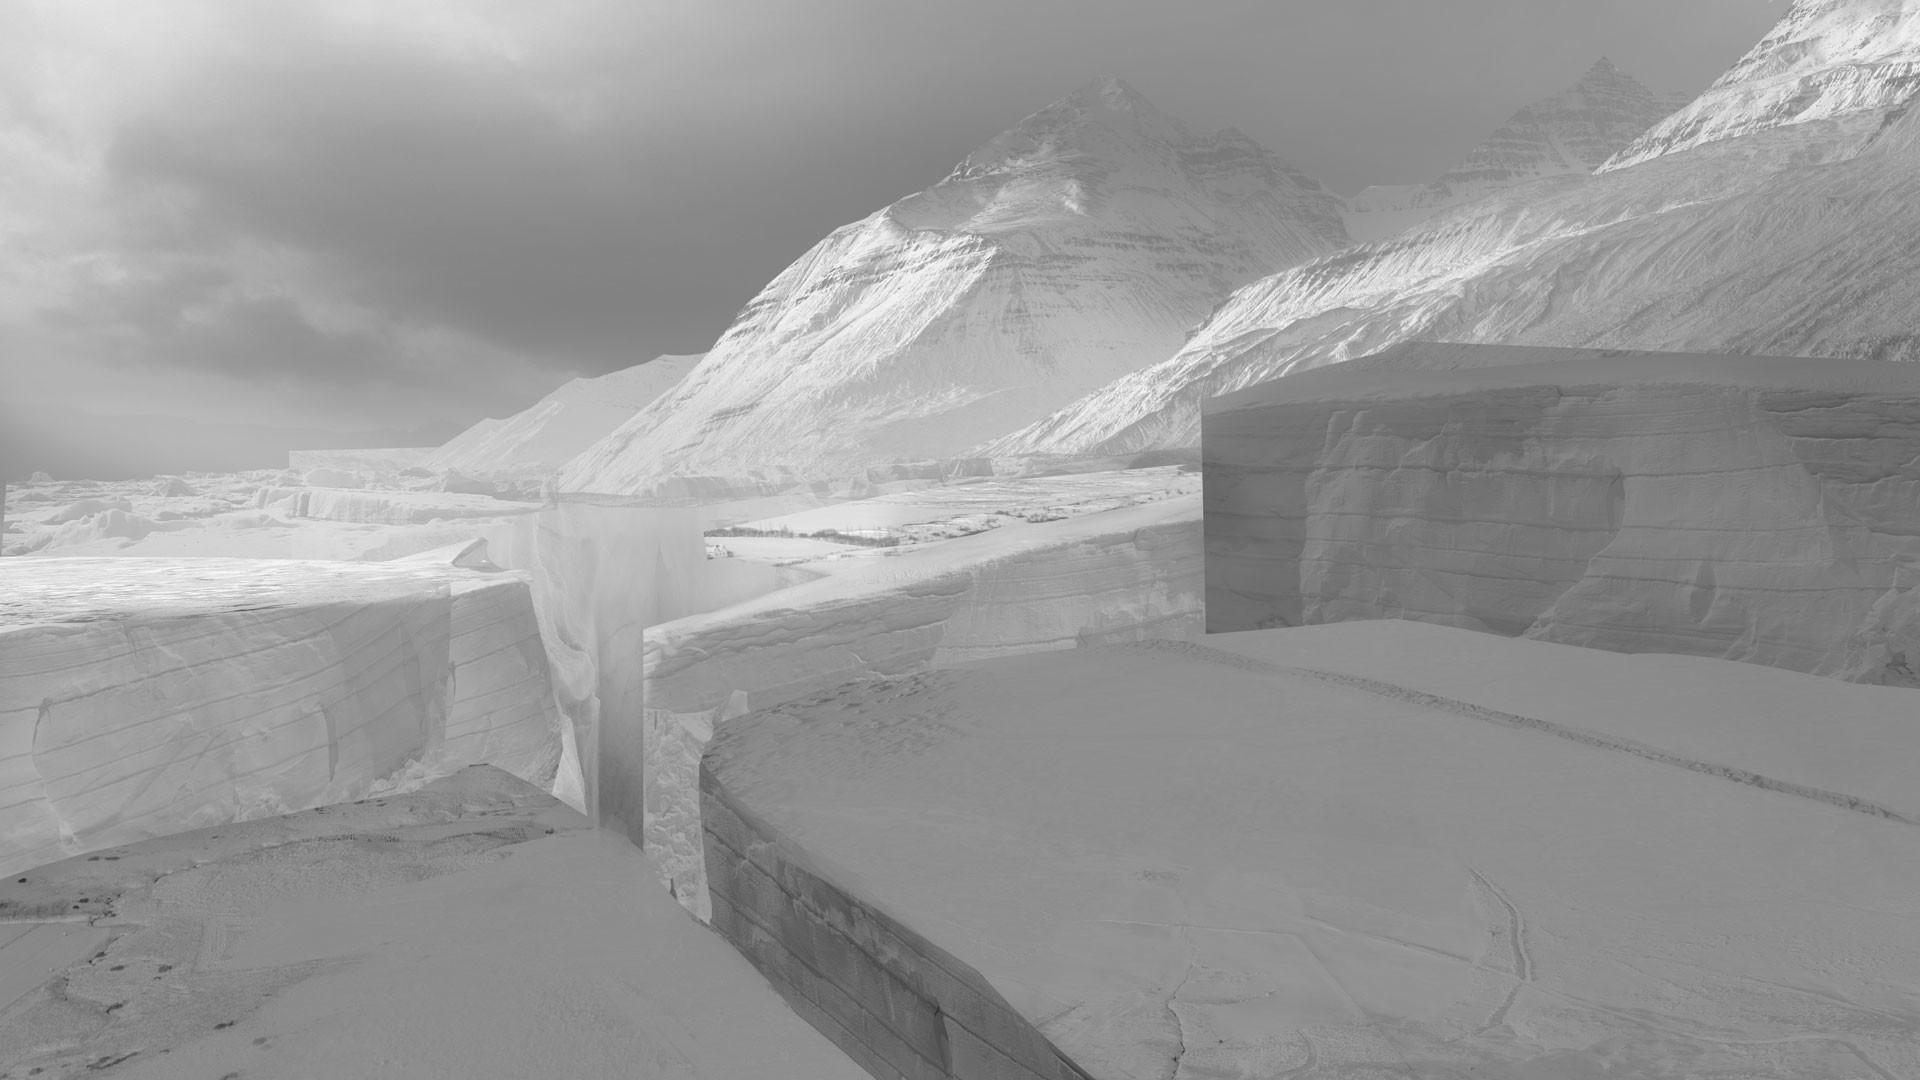 Marina ortega matte ice alien landscape 01